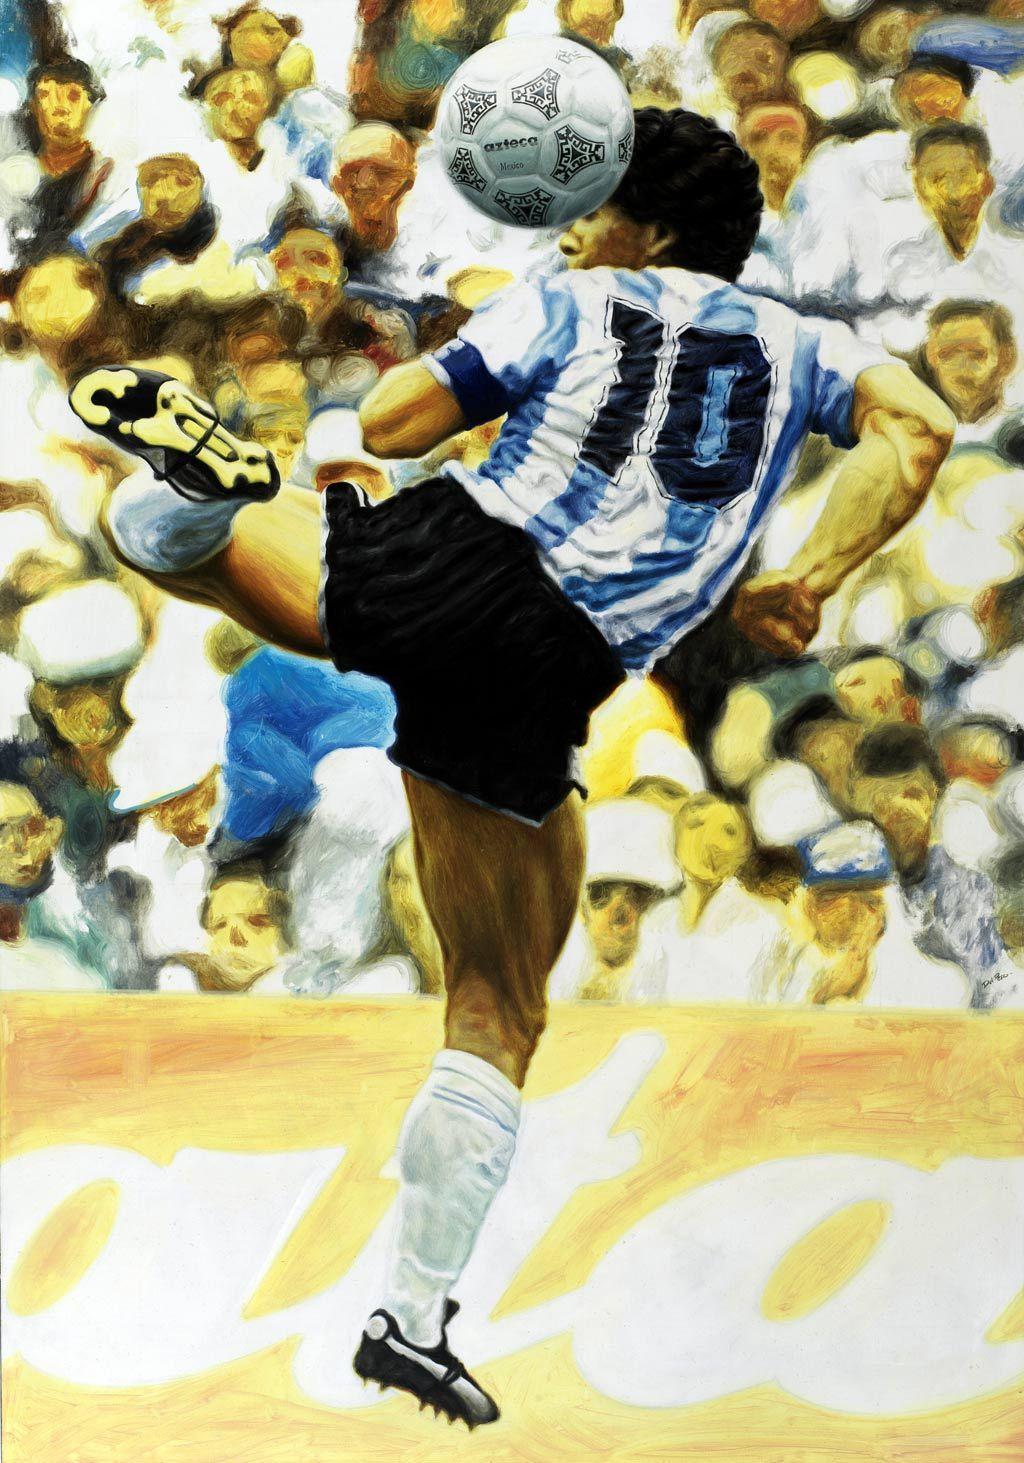 Diego Armando Maradona Argentina Mundial Mexico 1986 World Cup Artwork By Artist Andrea Del Pesco Oil Pai Fotos De Futbol Poster De Futbol Leyendas De Futbol